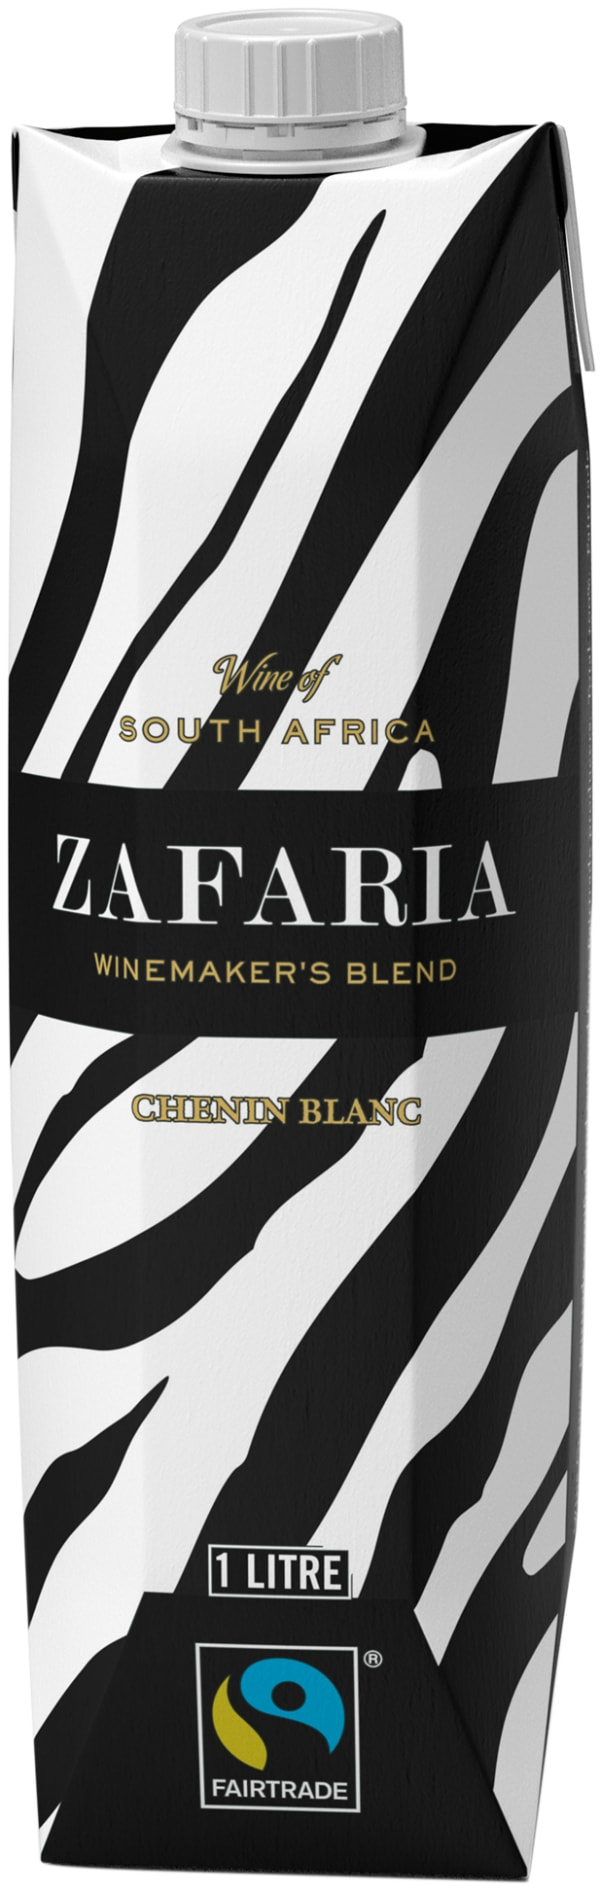 Zafaria Winemakers Blend Chenin Blanc 2018 kartongförpackning